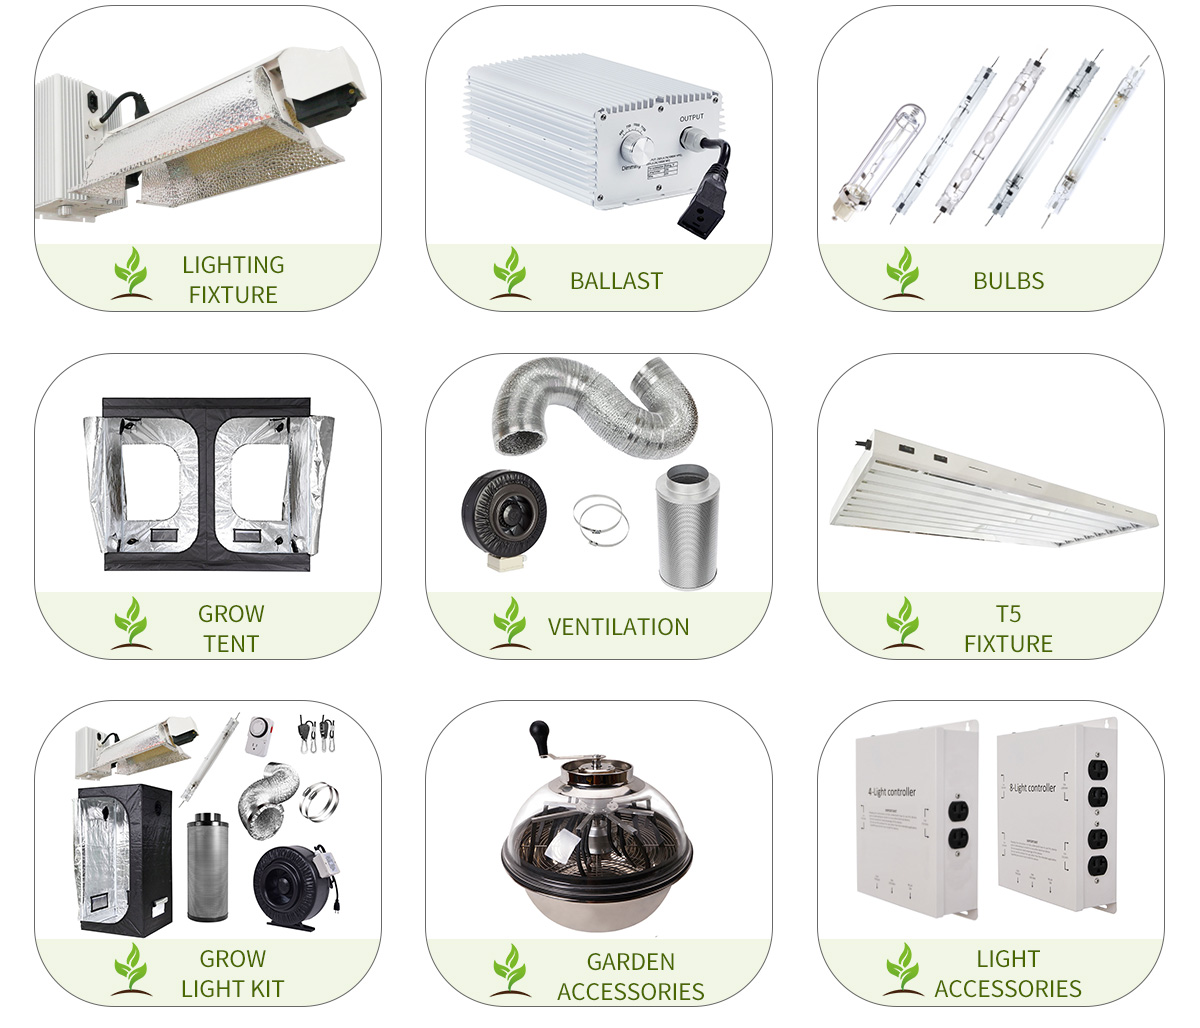 Wenzhou Hengxiong Electric Co., Ltd. - Light Reflector, Electronic